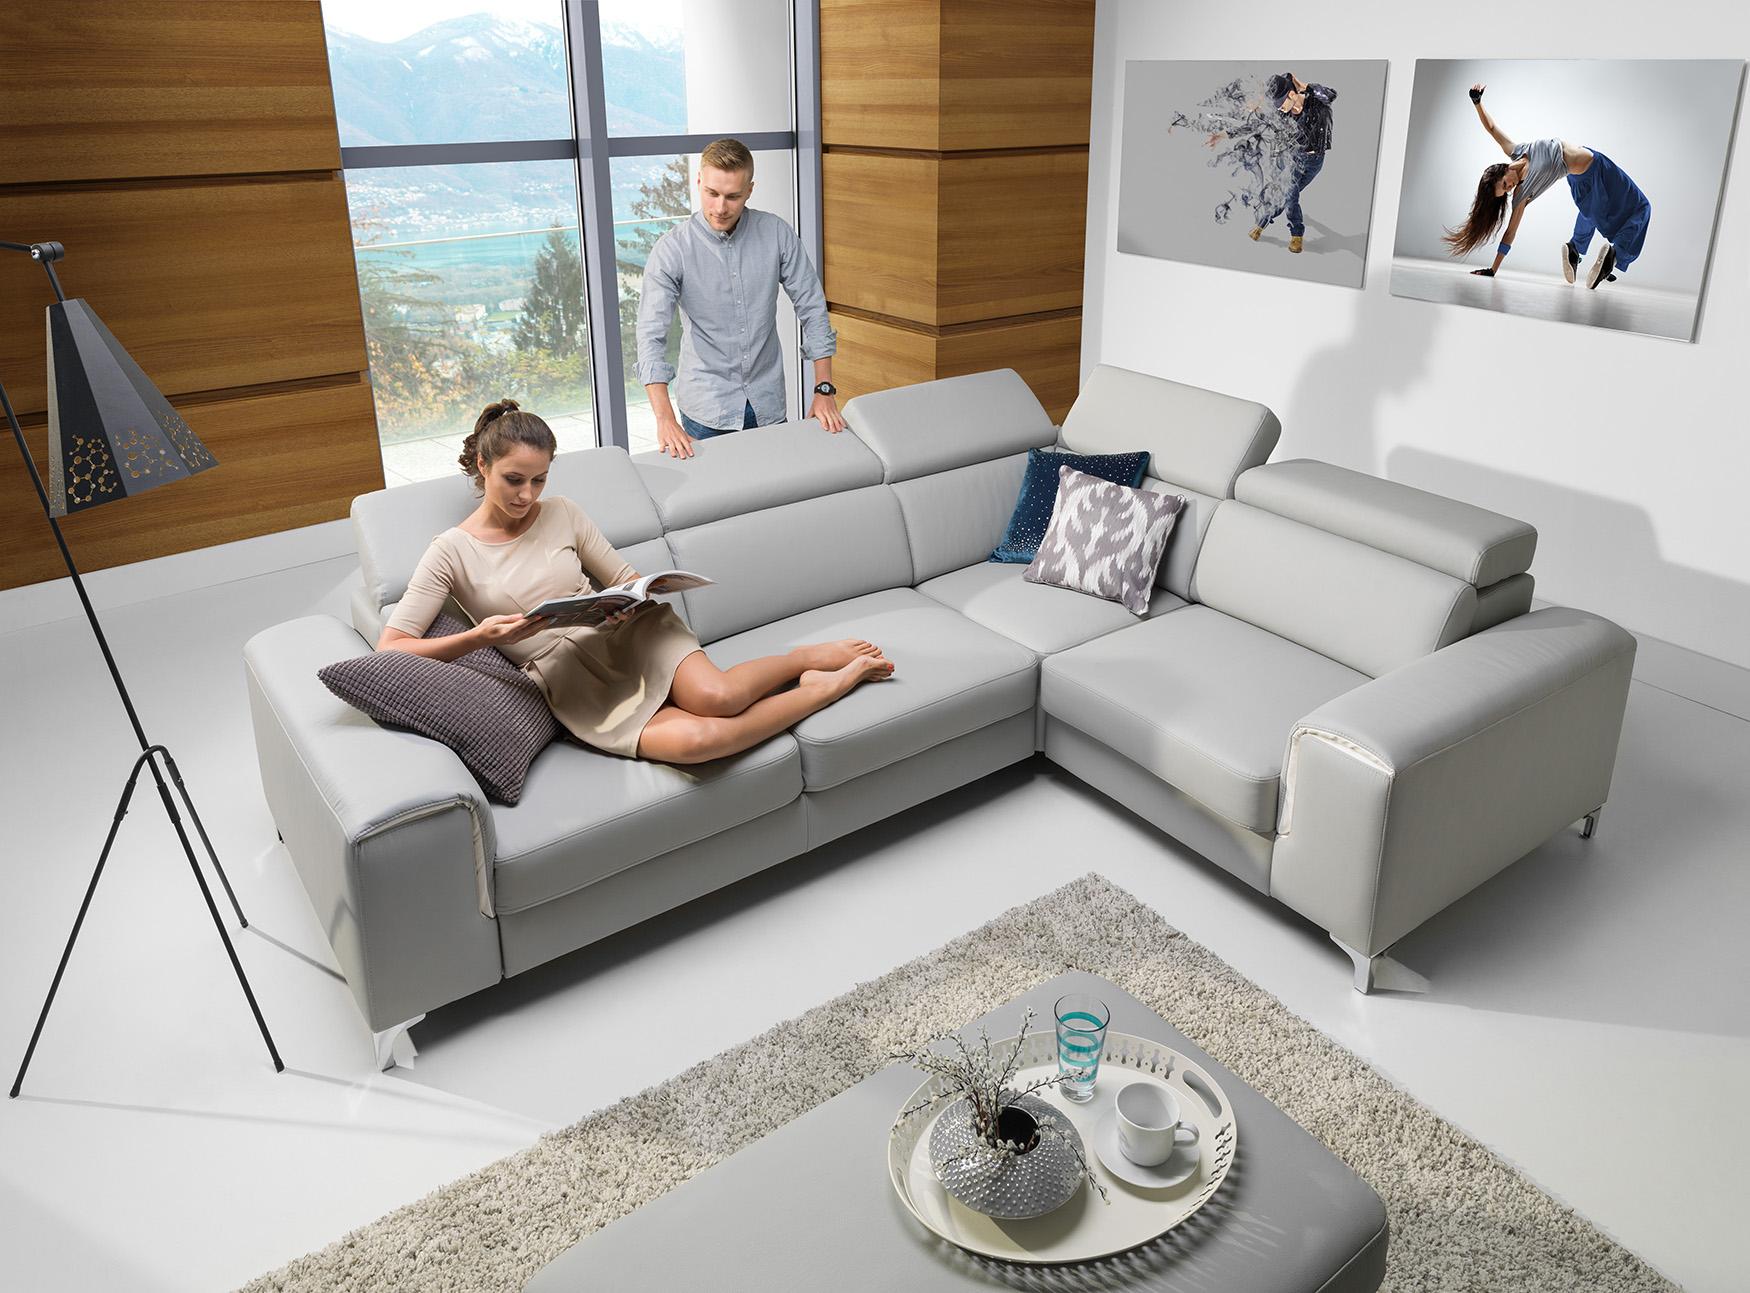 Sofa bed GENOA ORIGINAL by Furniturecity.ie